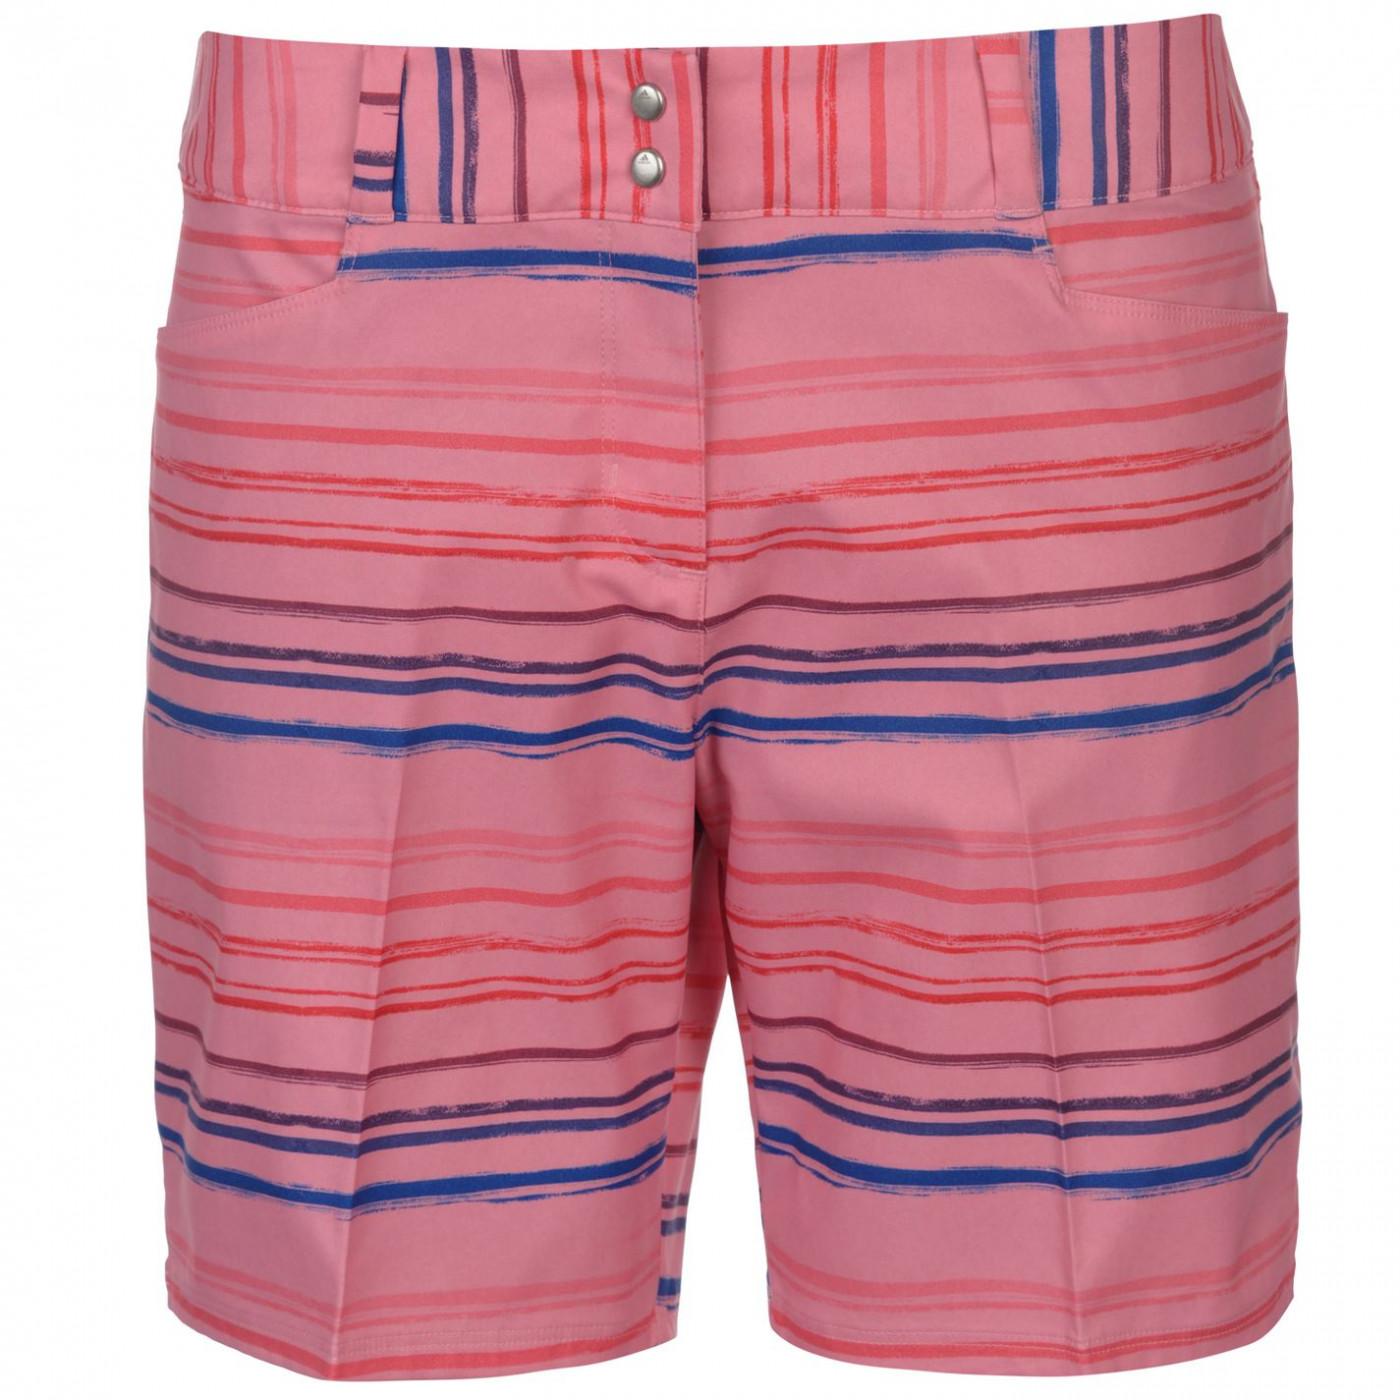 adidas printed shorts ladies factcool